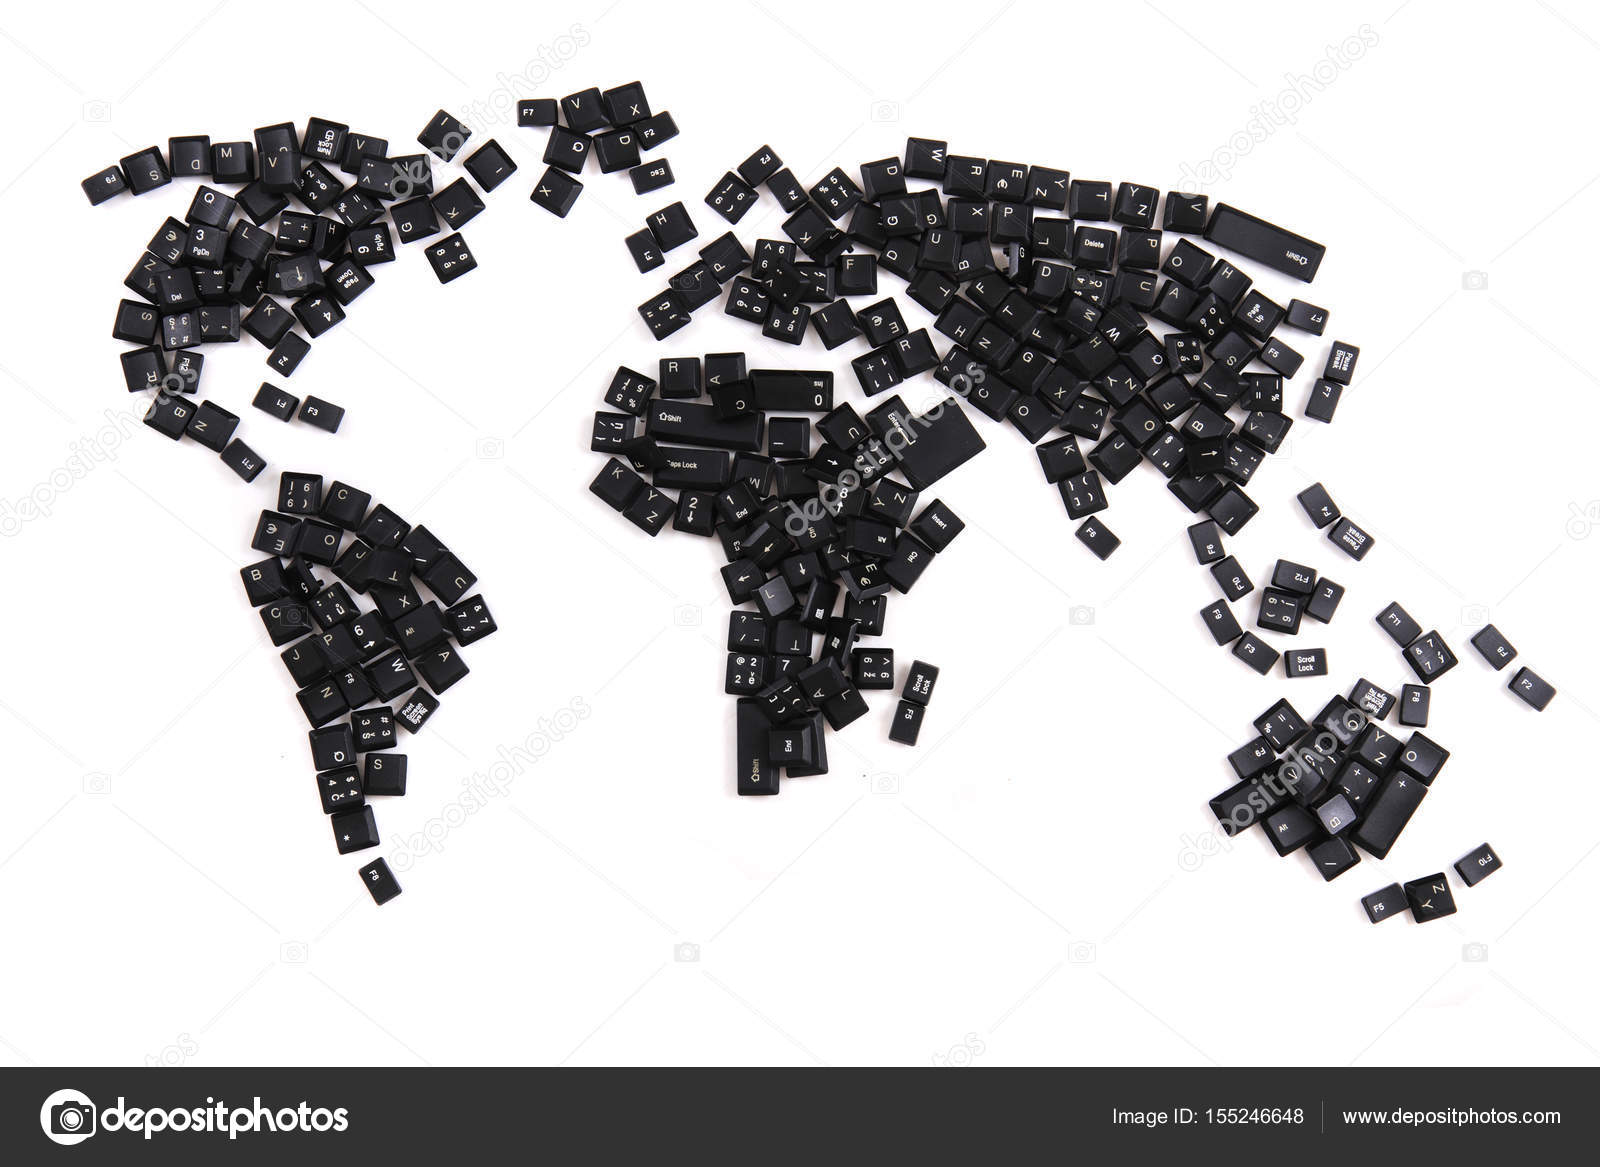 Black keyboard keys as world map stock photo jonnysek 155246648 black keyboard keys as world map isolated on the white background photo by jonnysek gumiabroncs Gallery